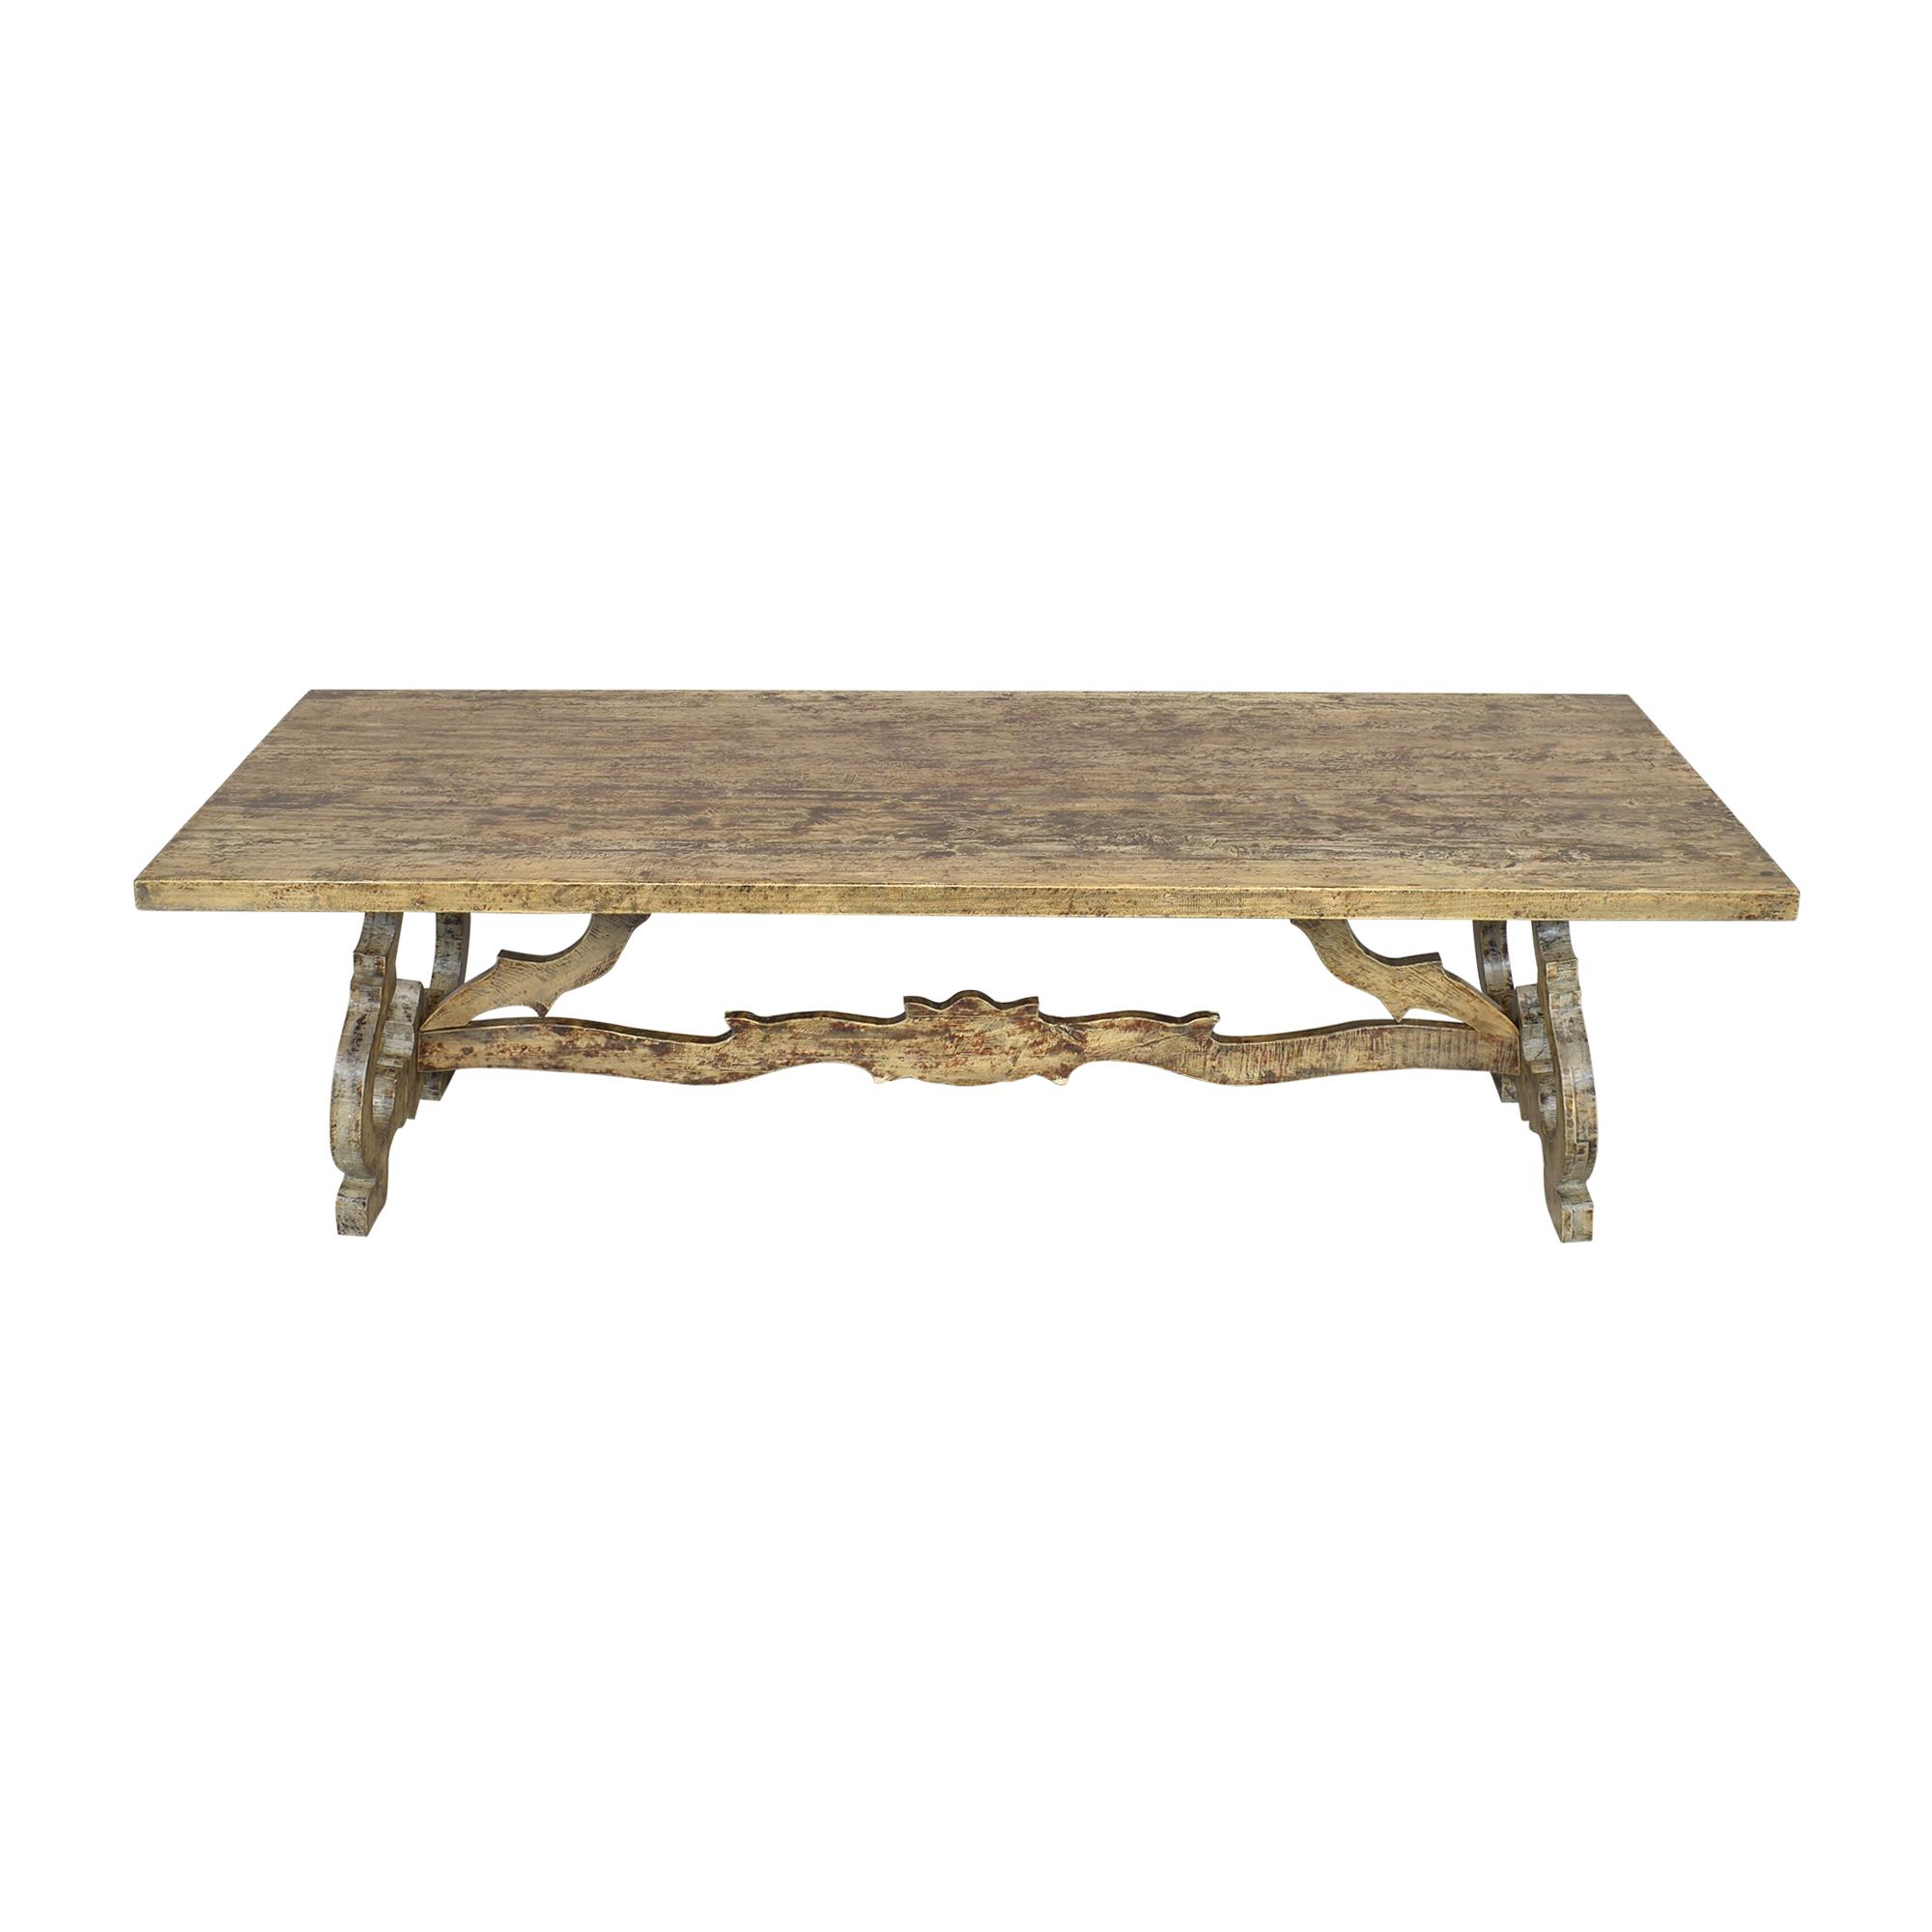 Rustic Rectangular Dining Table ma